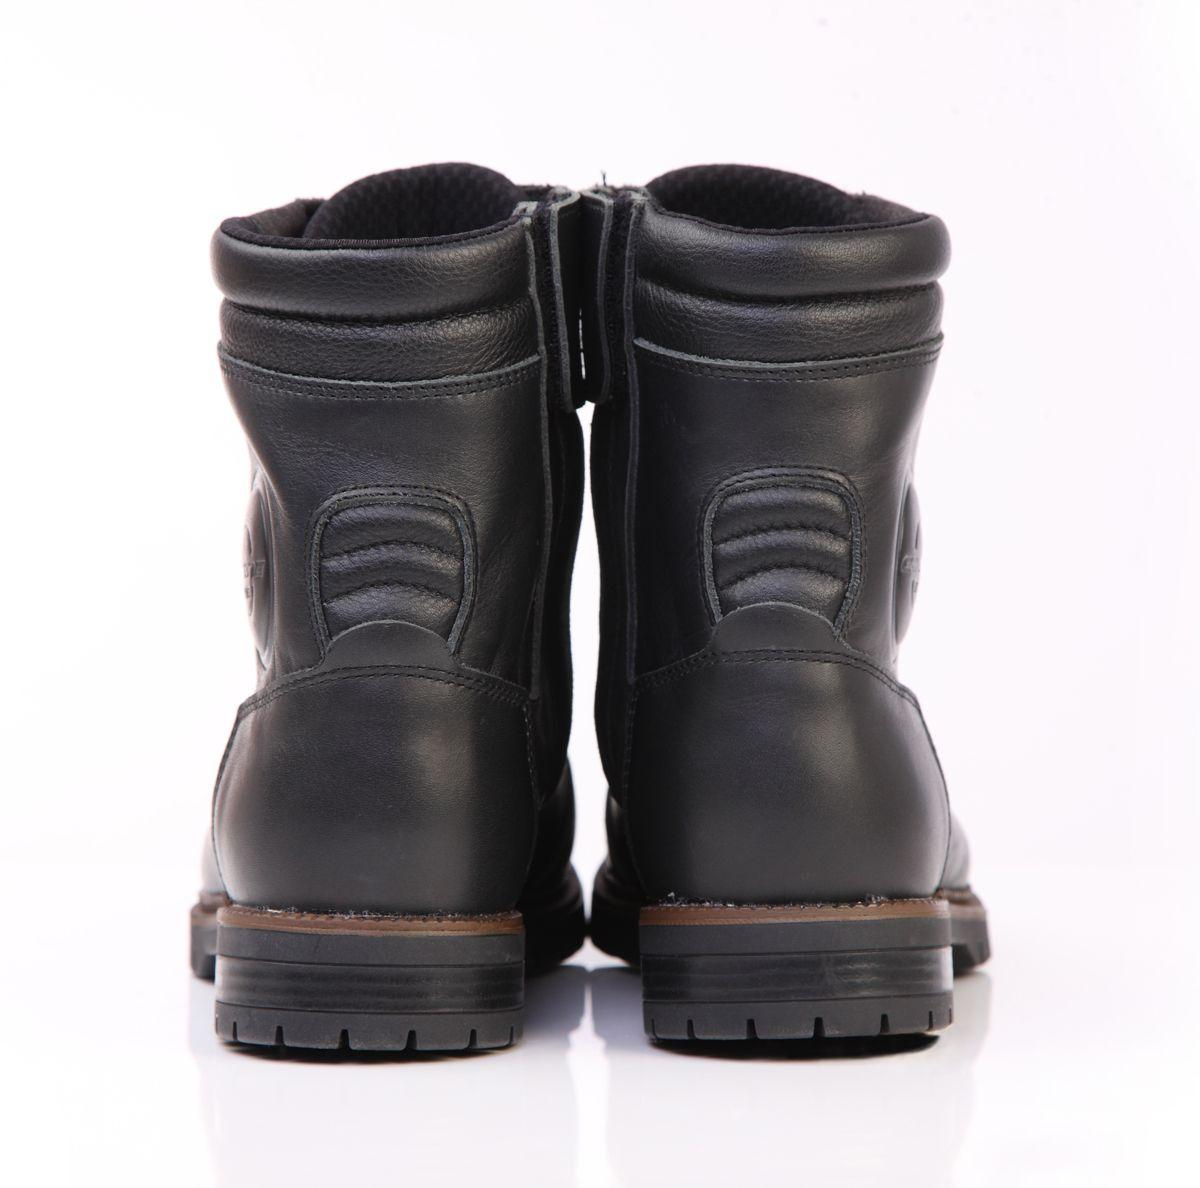 【gaerne】Neoretro防水車靴「GStone GORE-TEX」 - 「Webike-摩托百貨」